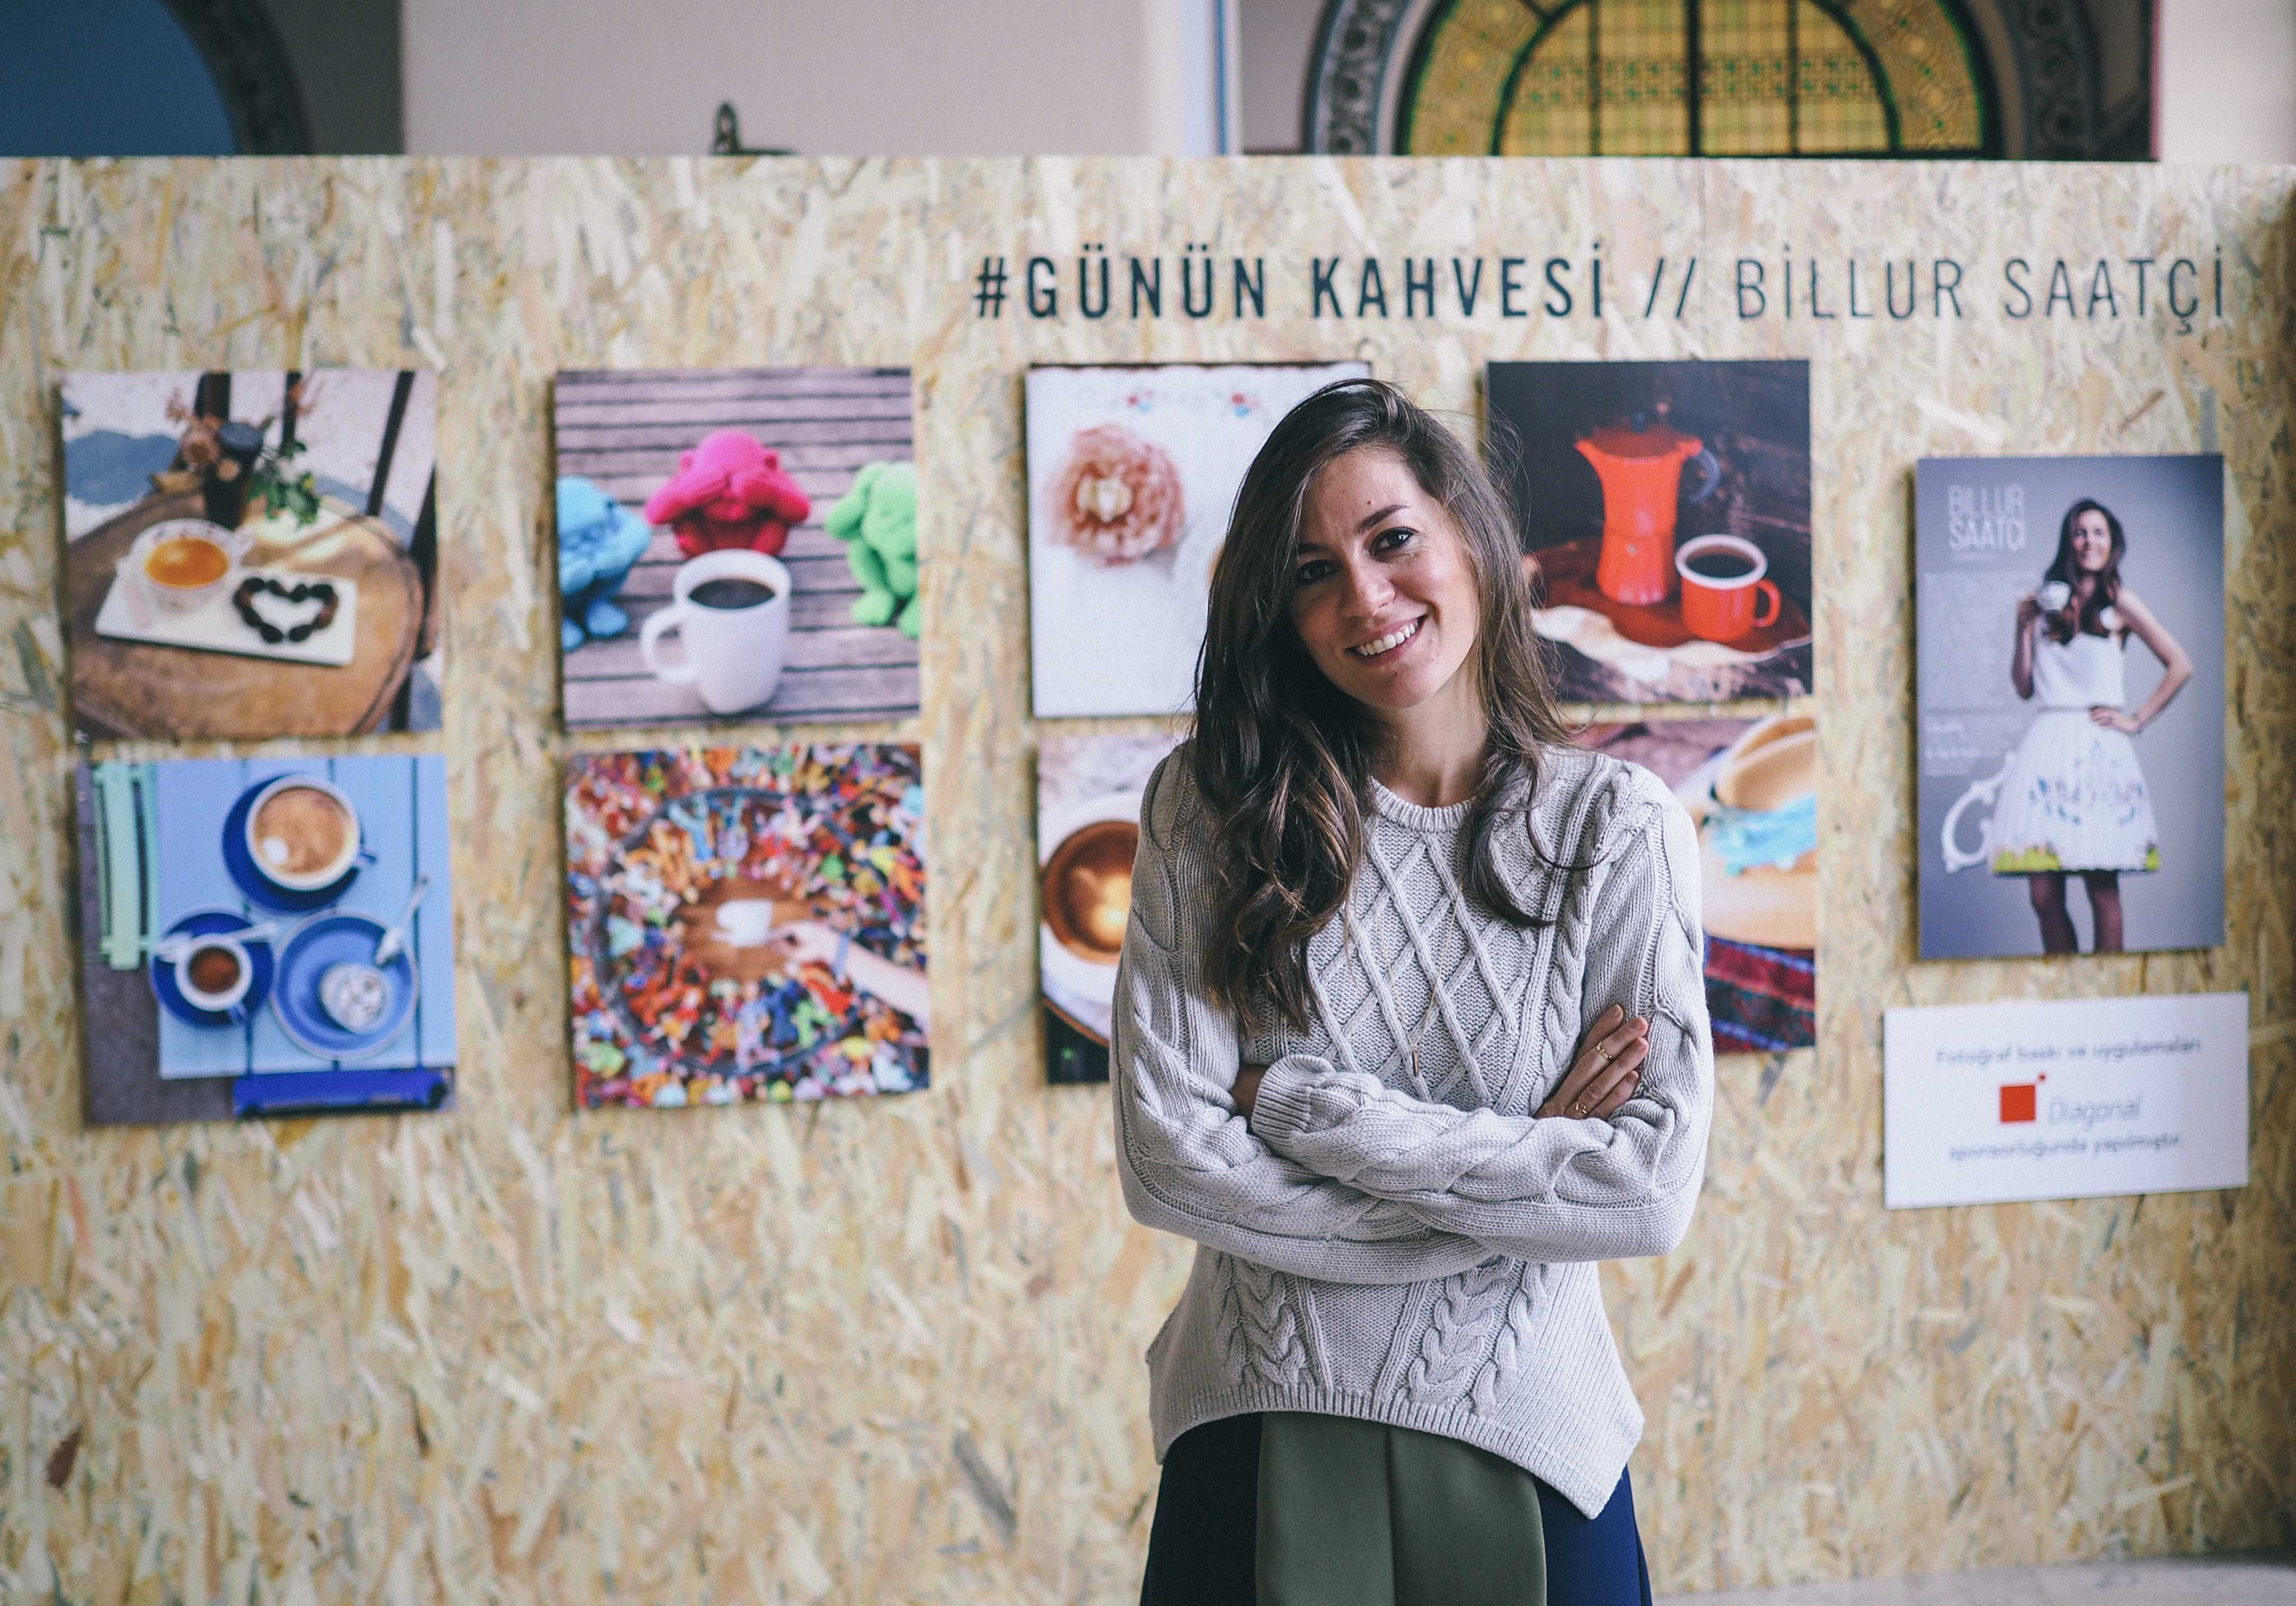 billur saatci, offnegiysem, turkish style blogger, street style, fashion, ootd, blogger, istanbul, istanbul kahve festivali, istanbul coffee festival, kahve festivali, bir silgi bir kalem, gununkahvesi, gününkahvesi, günün kahvesi sergisi,